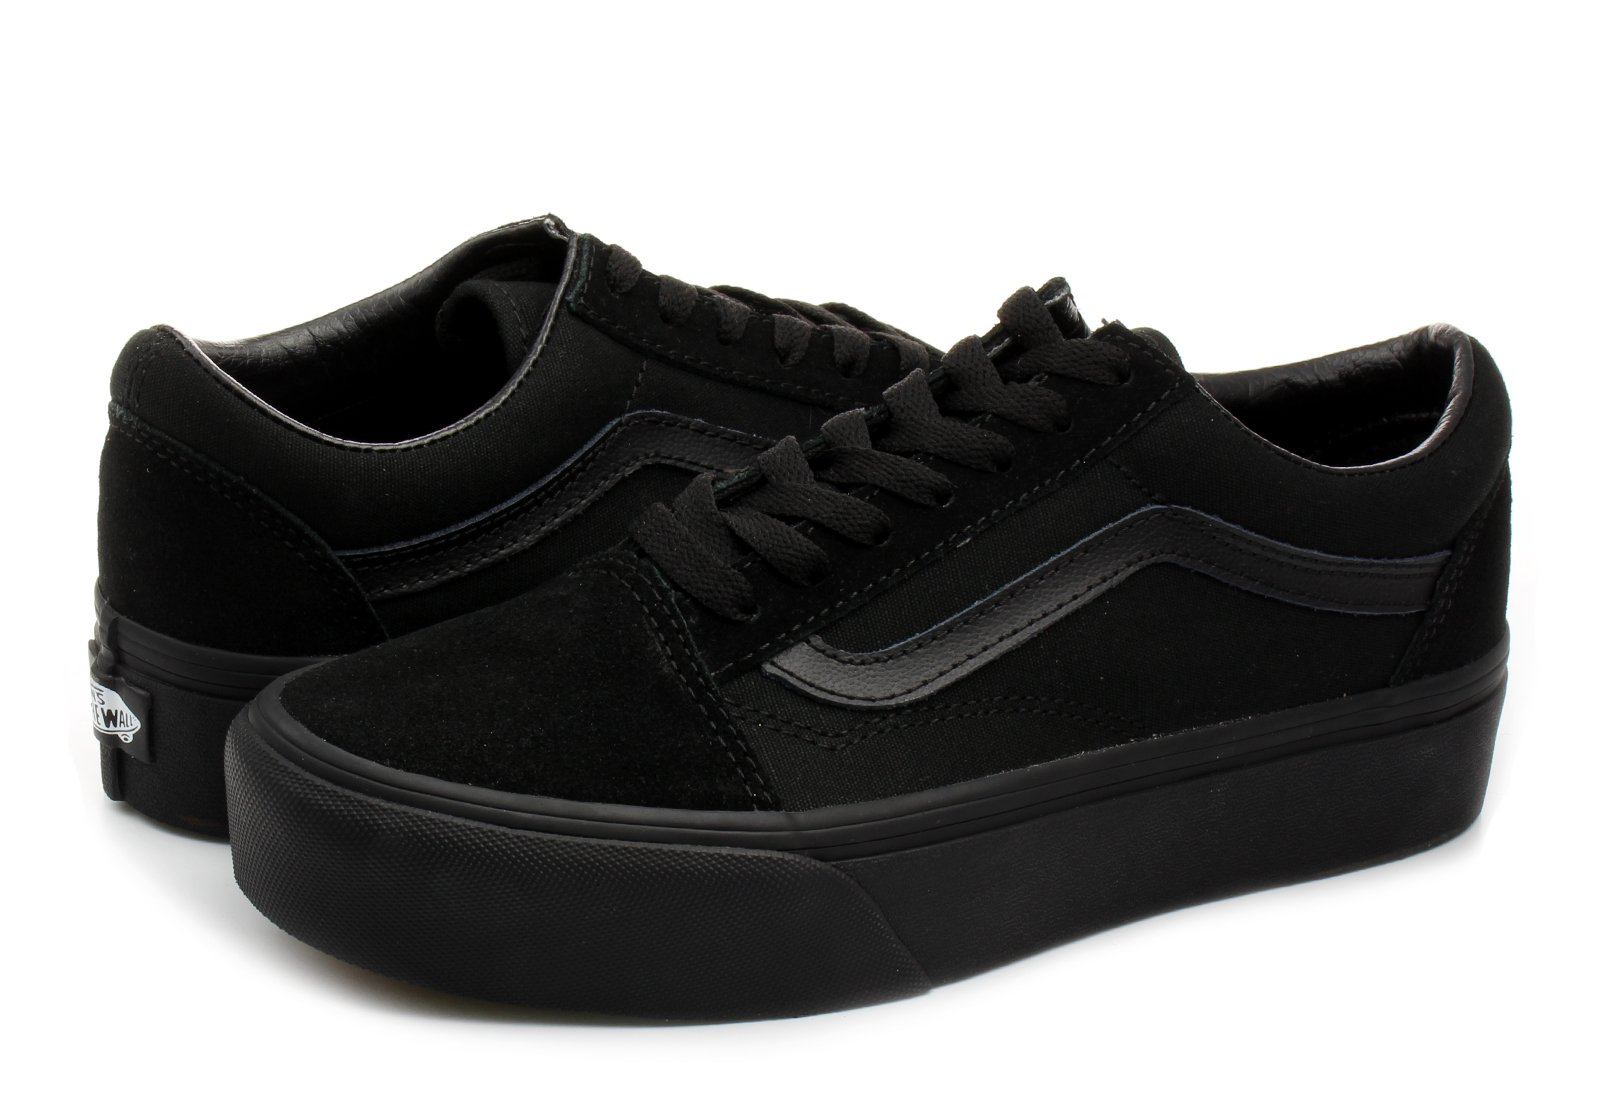 Vans Sneakers Old Skool Platform Va3b3ubka Online